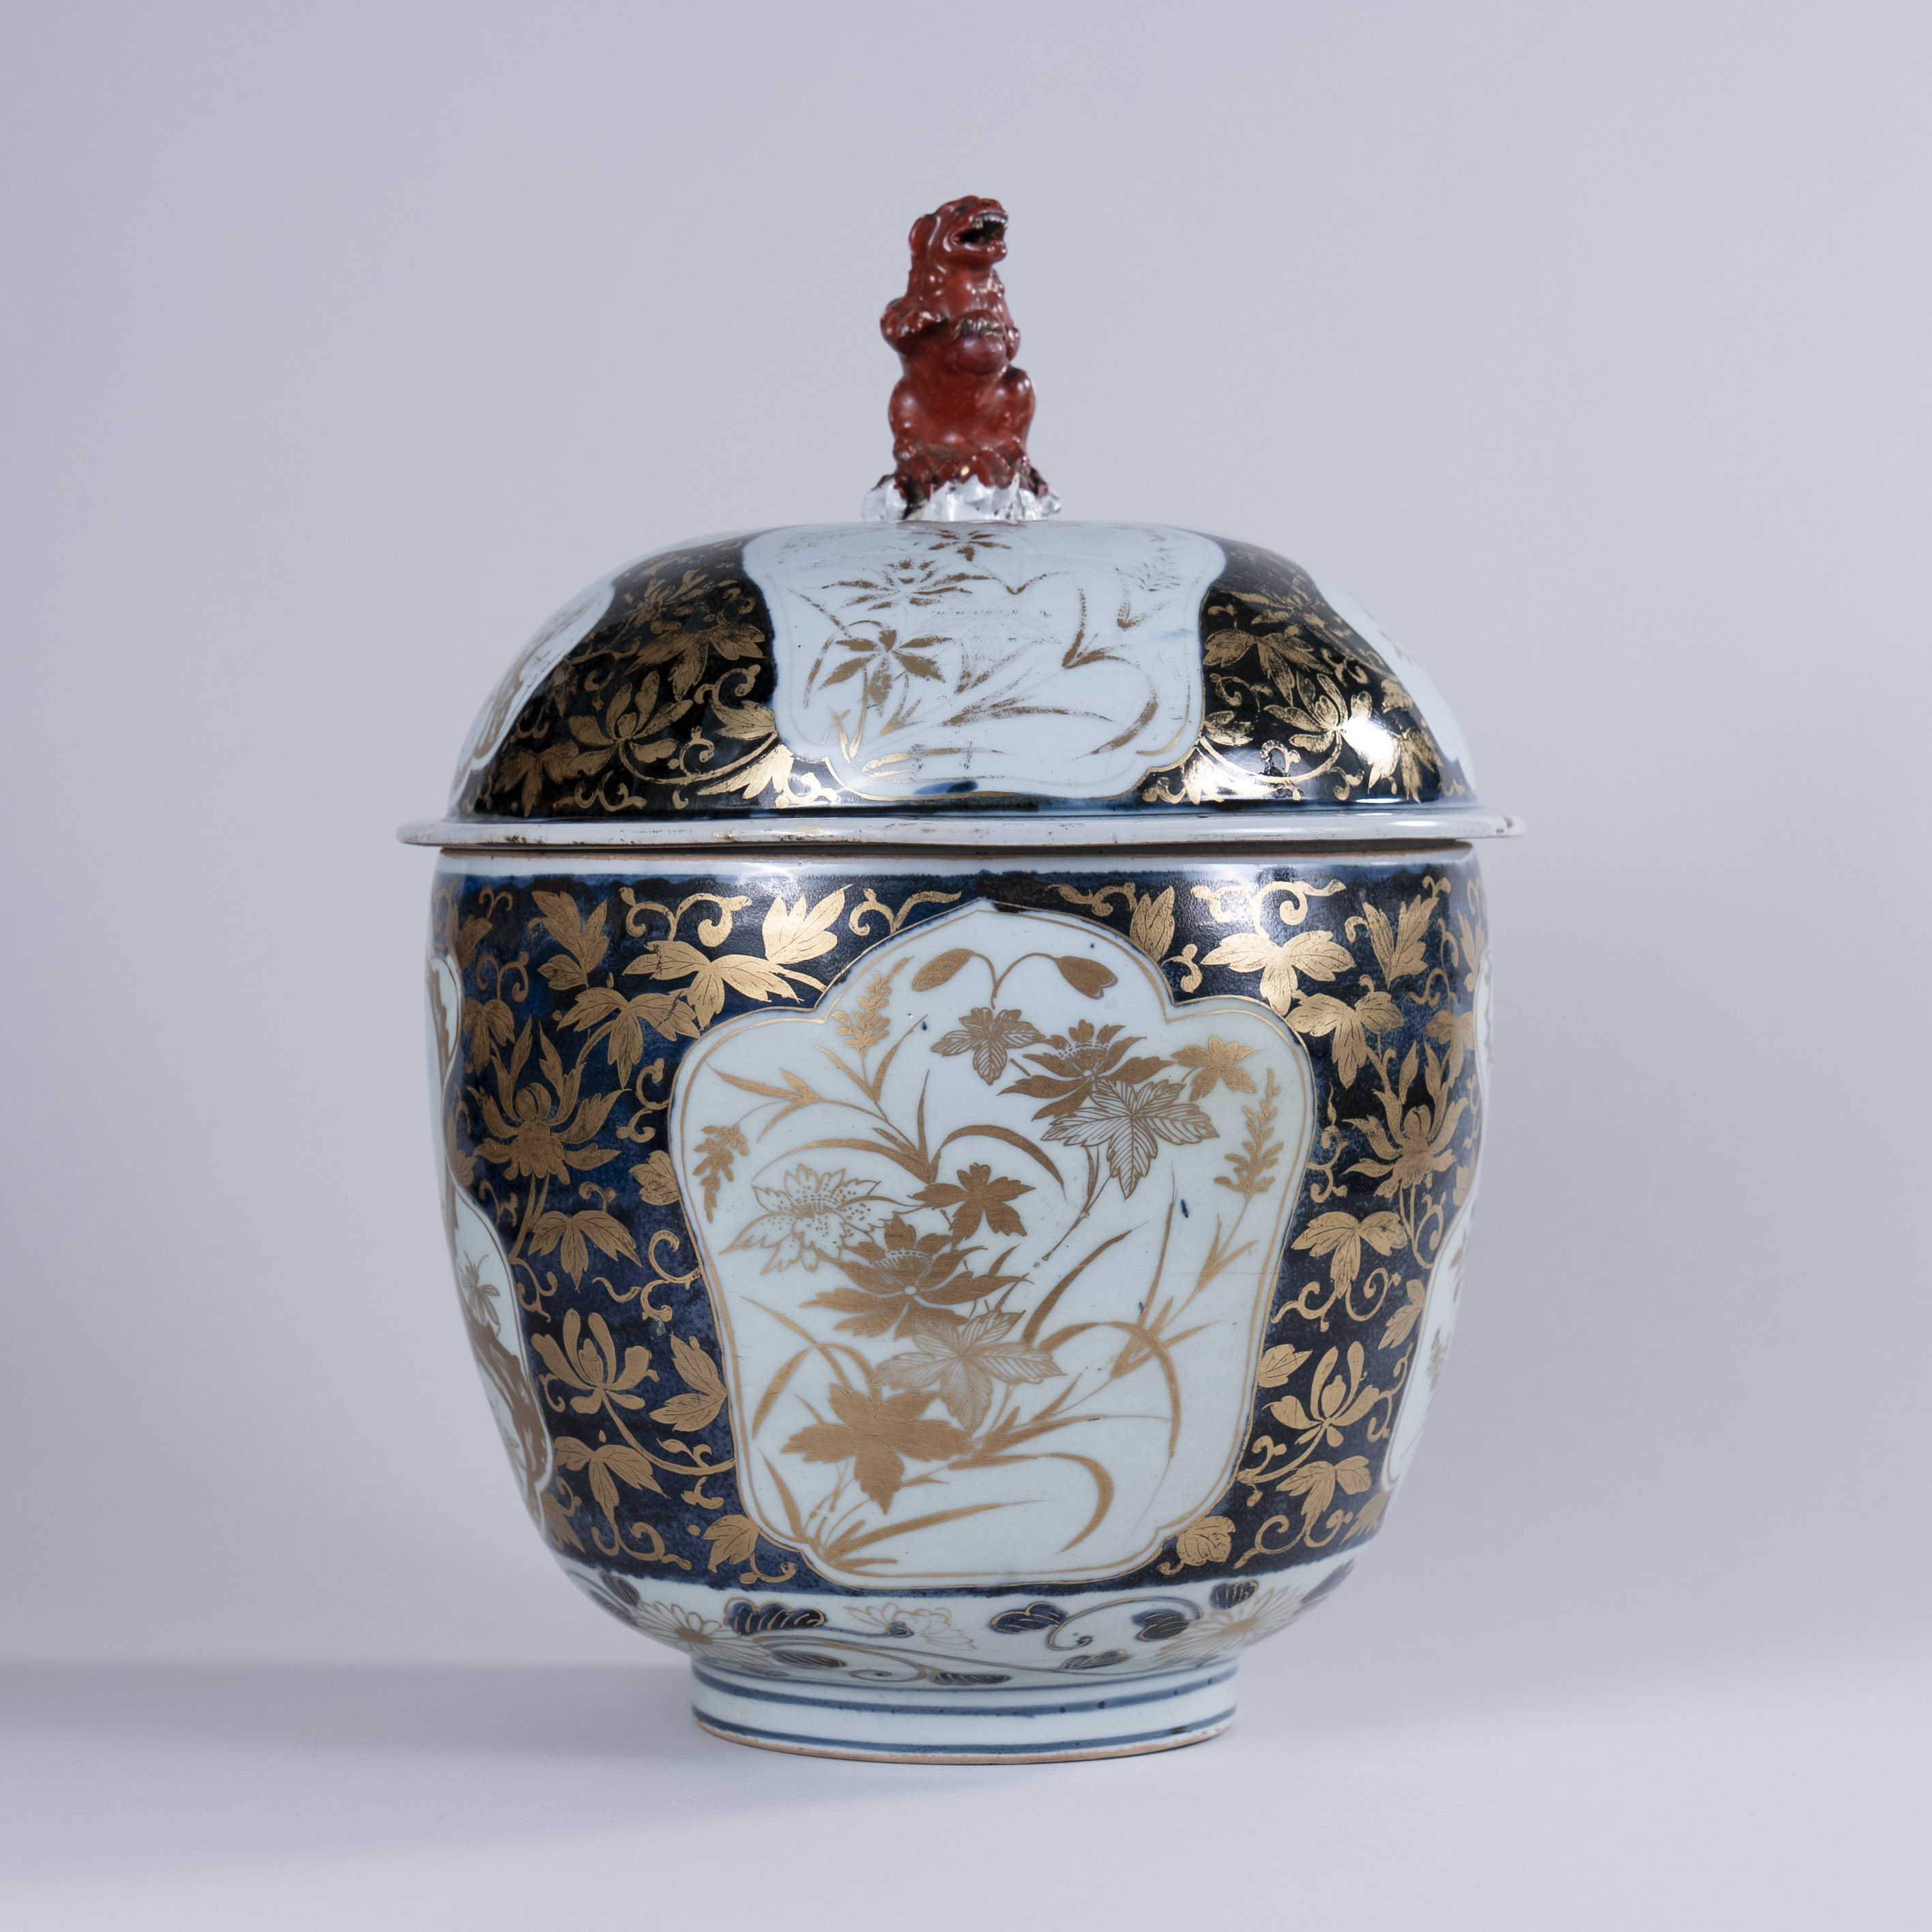 Excellent Japanese Arita Covered Bowl, circa 1720